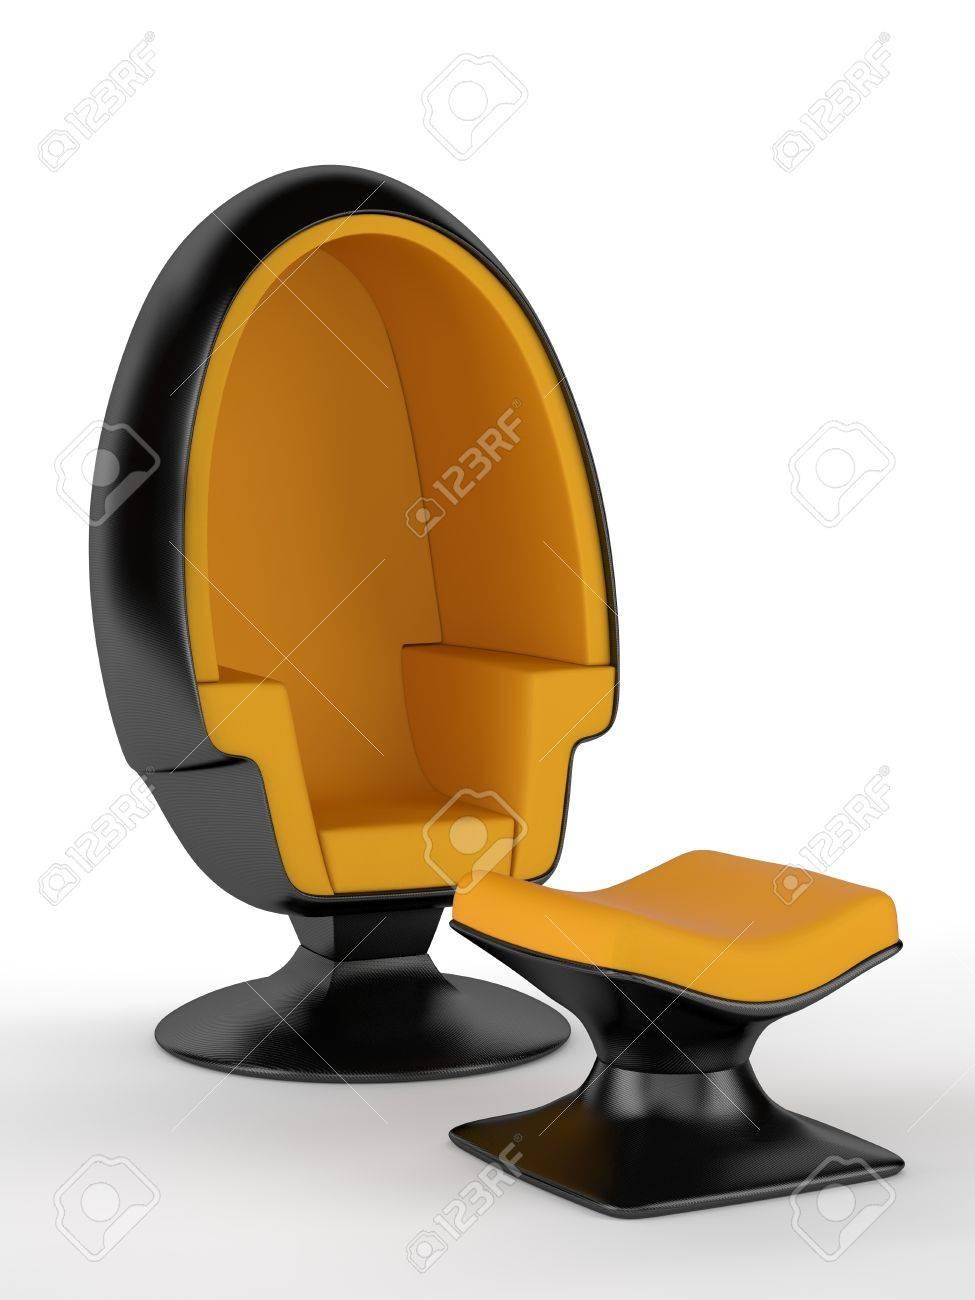 Carbon Fiber Chair Modern Furniture Render Carbon Fiber Chair On White Background